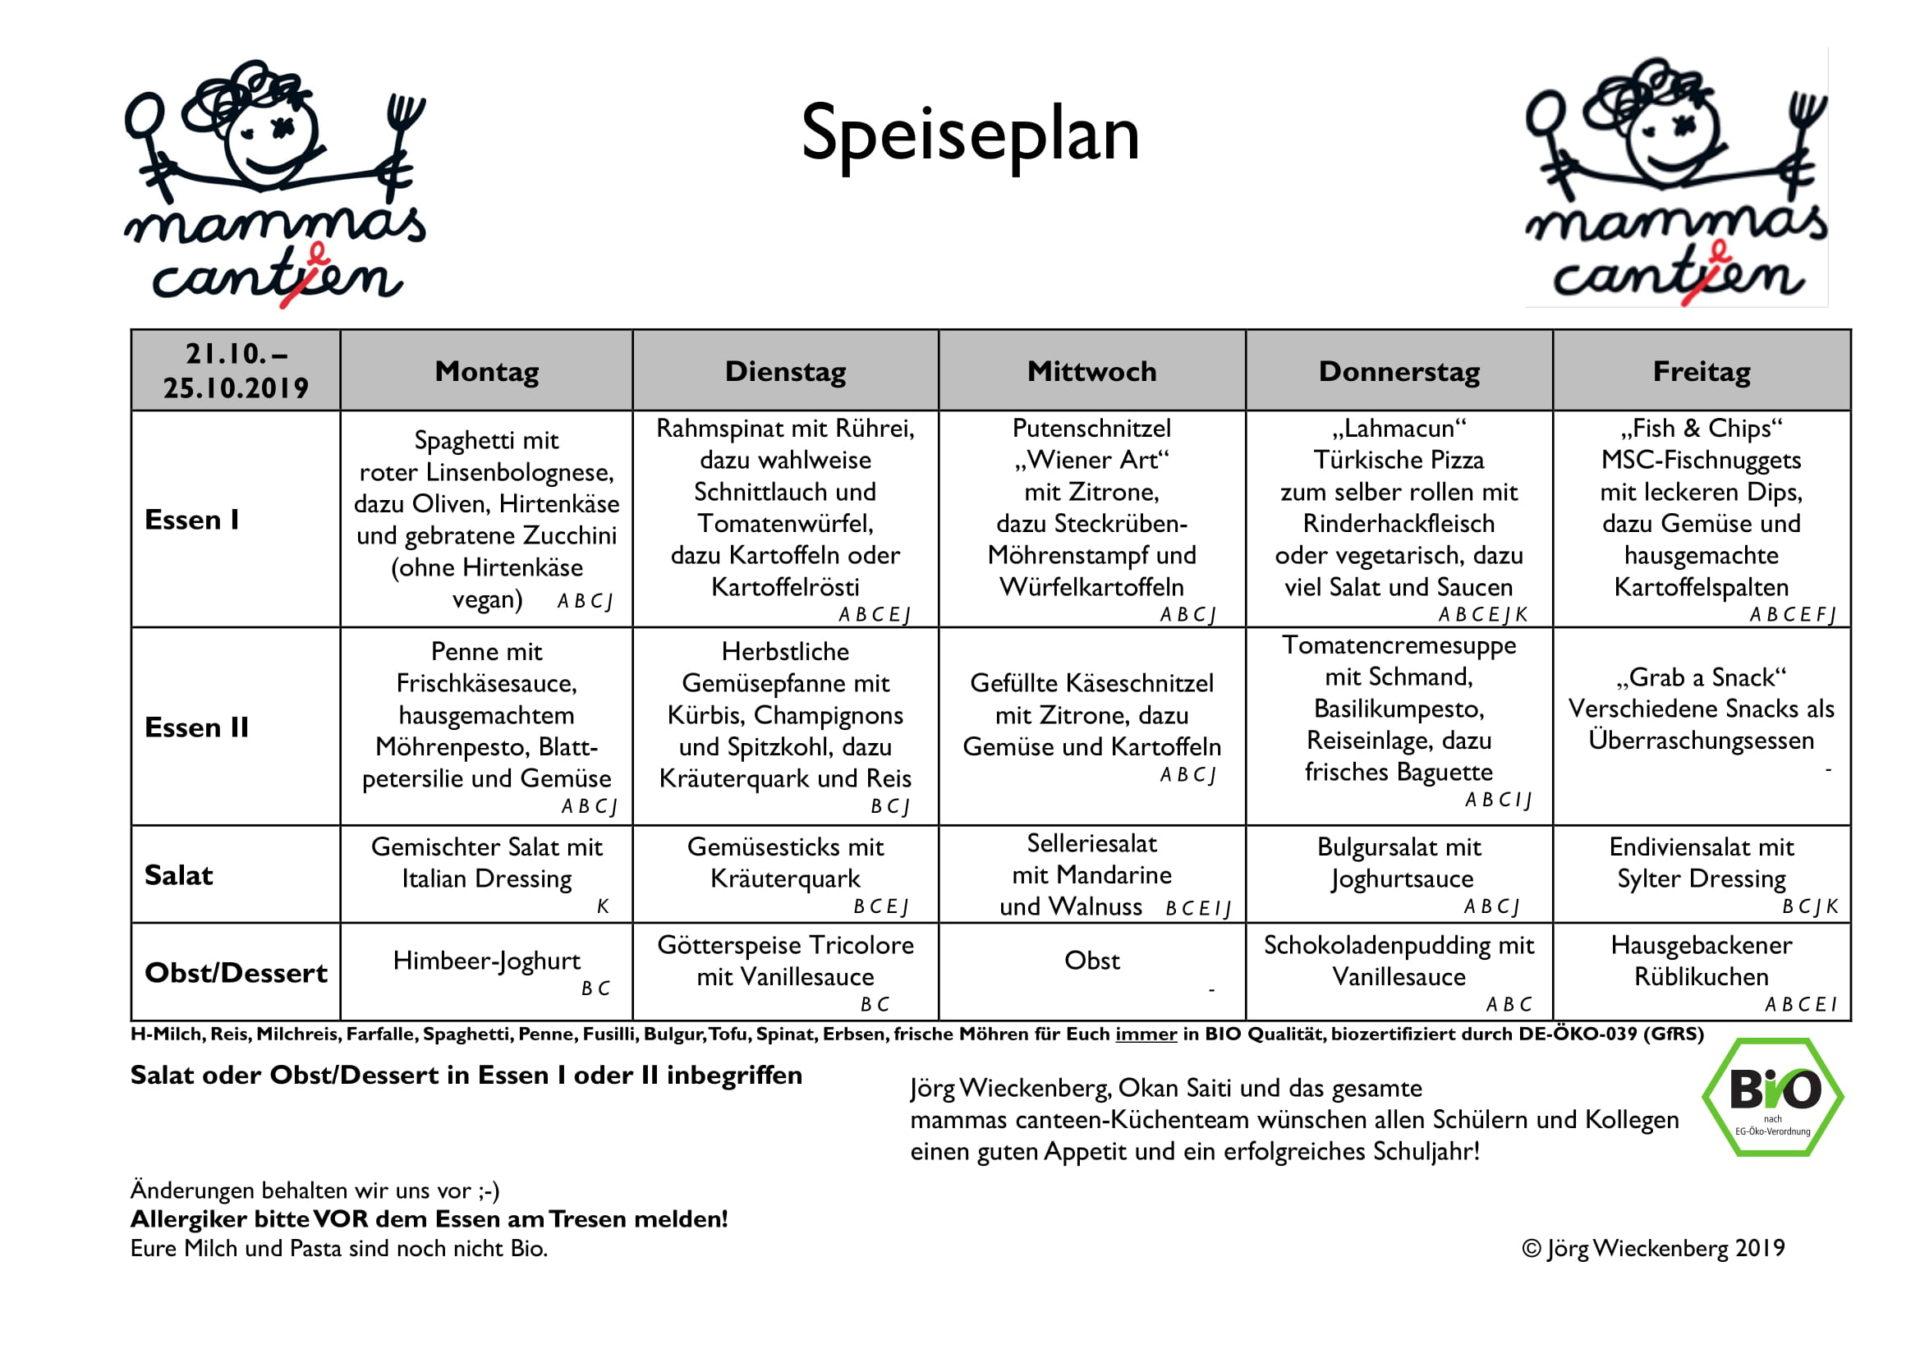 mammas canteen Speiseplan 21.10. -25.10.2019-1